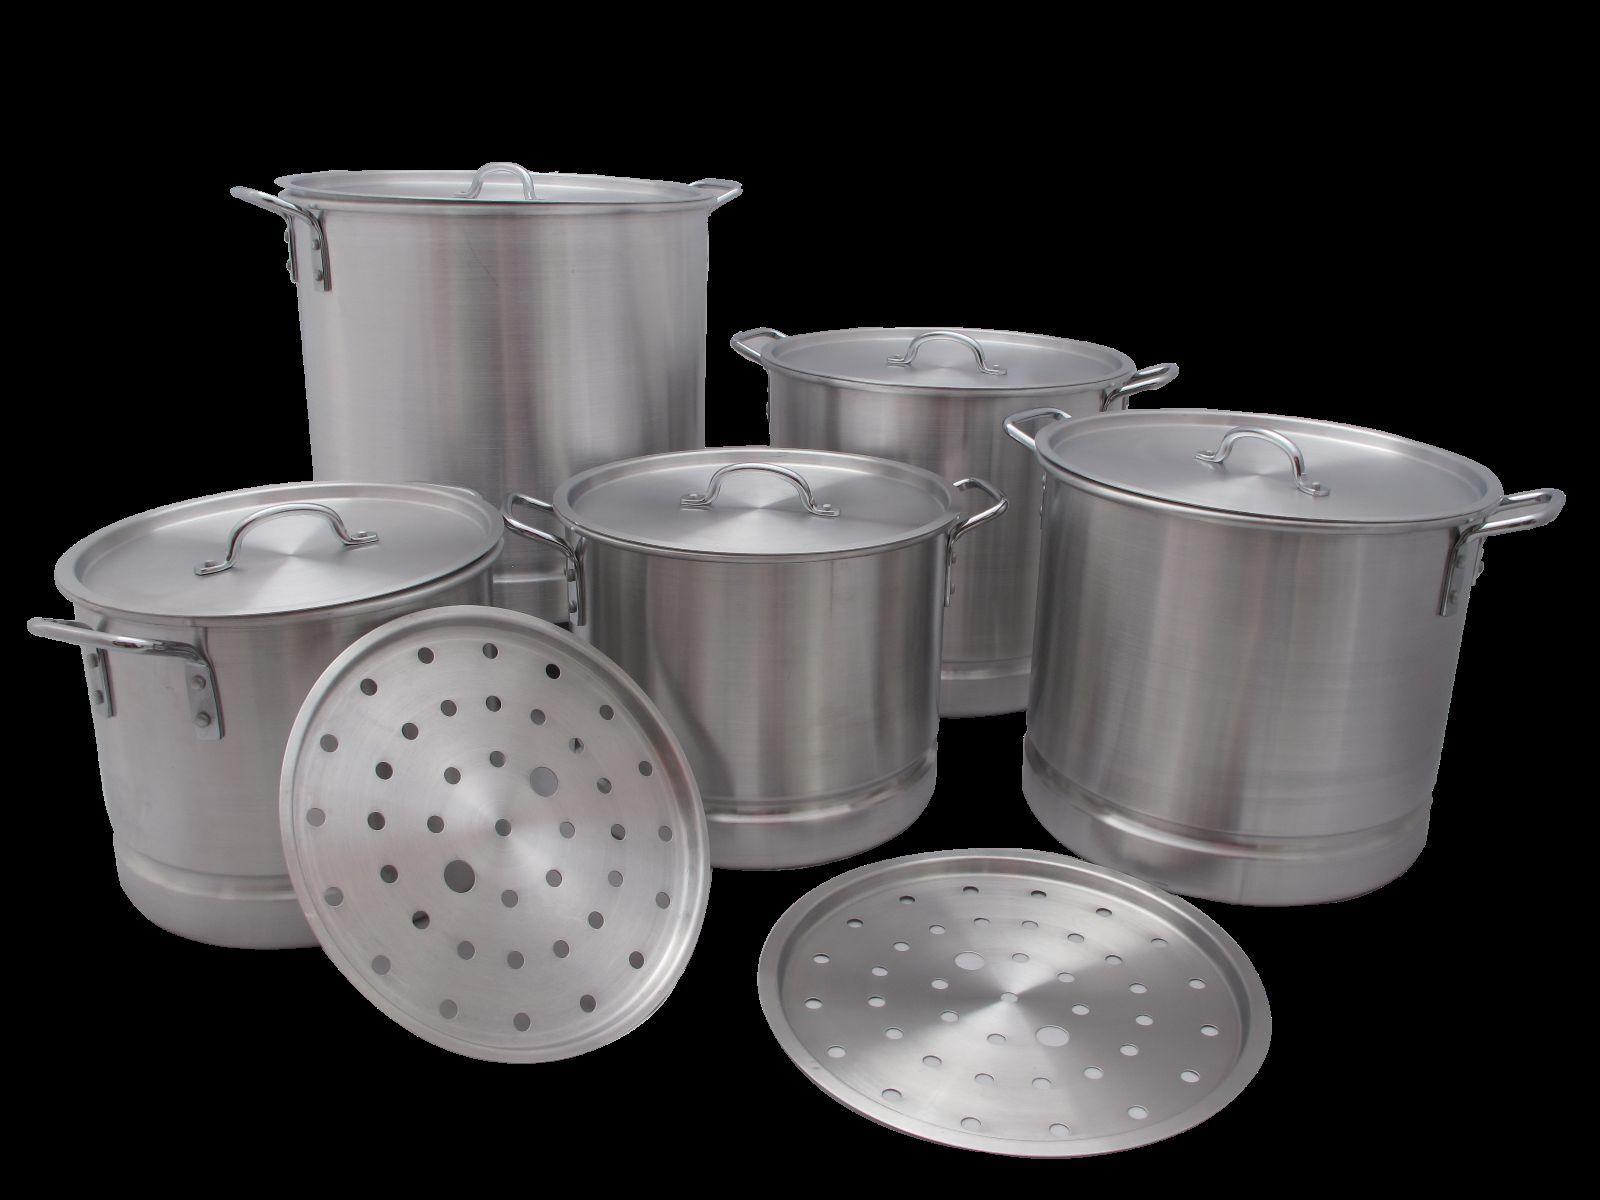 5 pc Thick Aluminum Stock Pot Set Steam Tamale Brew 20 24 32